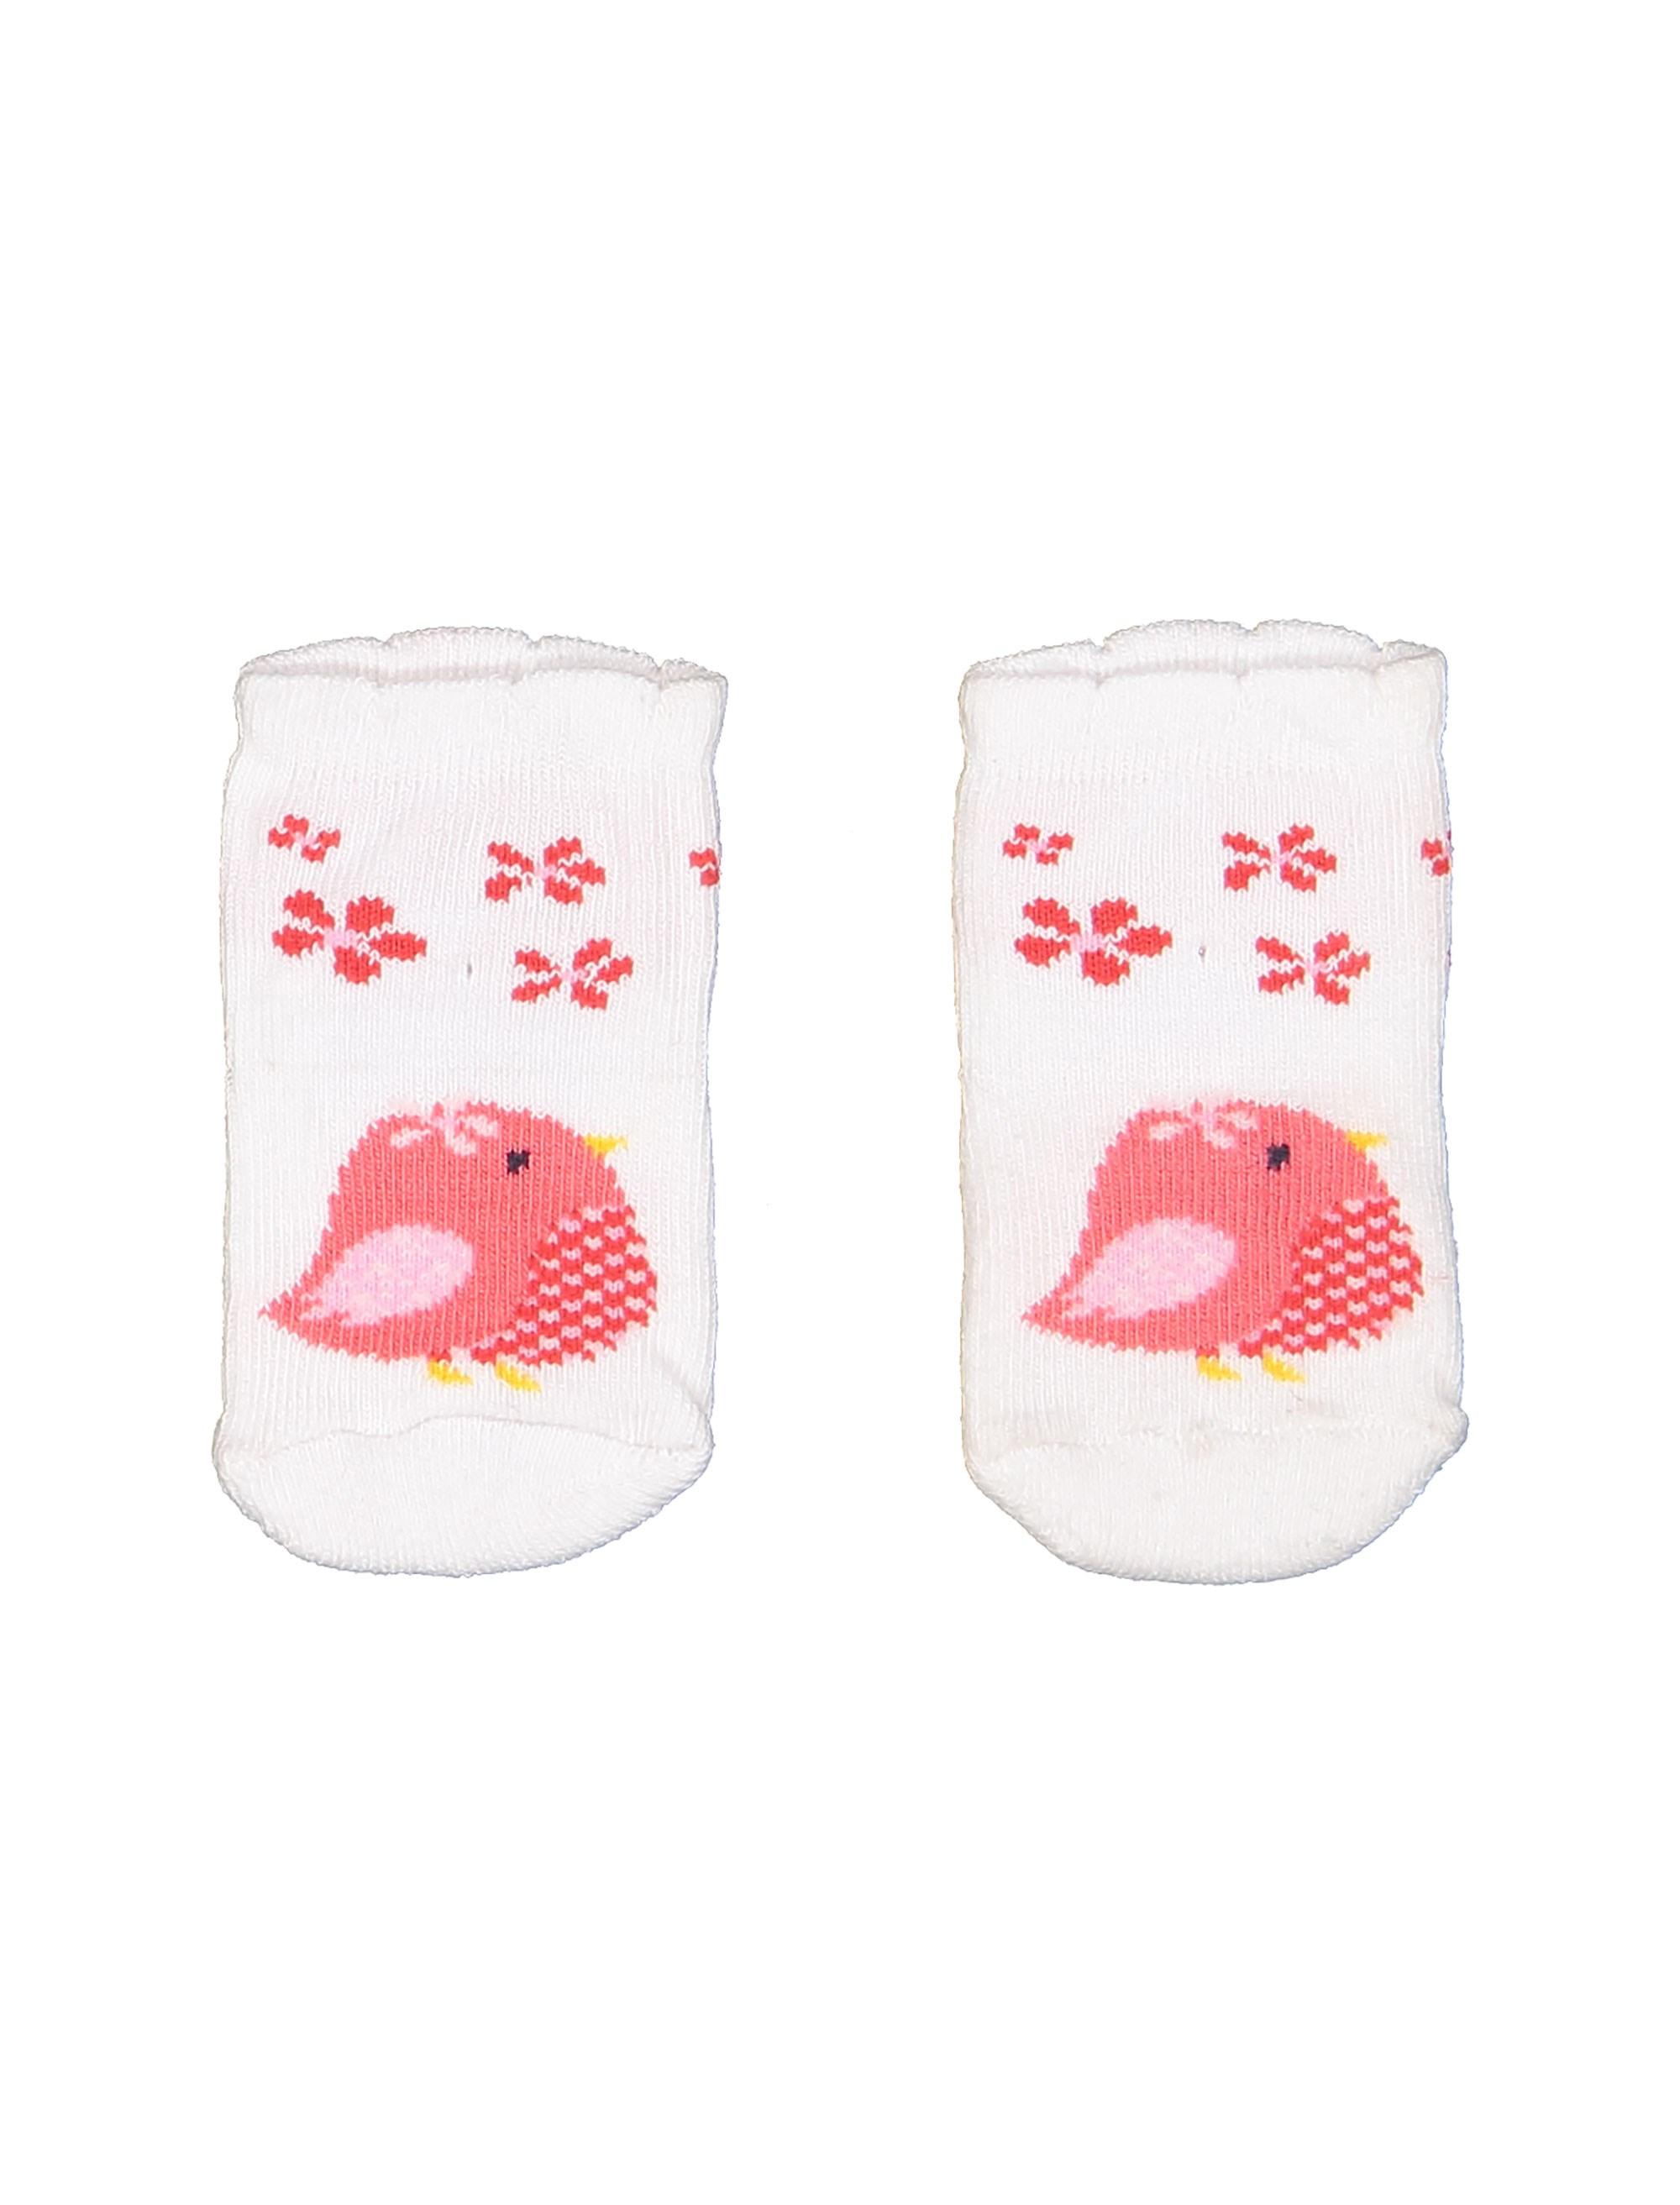 جوراب نخی طرح دار نوزادی - سفيد - 1